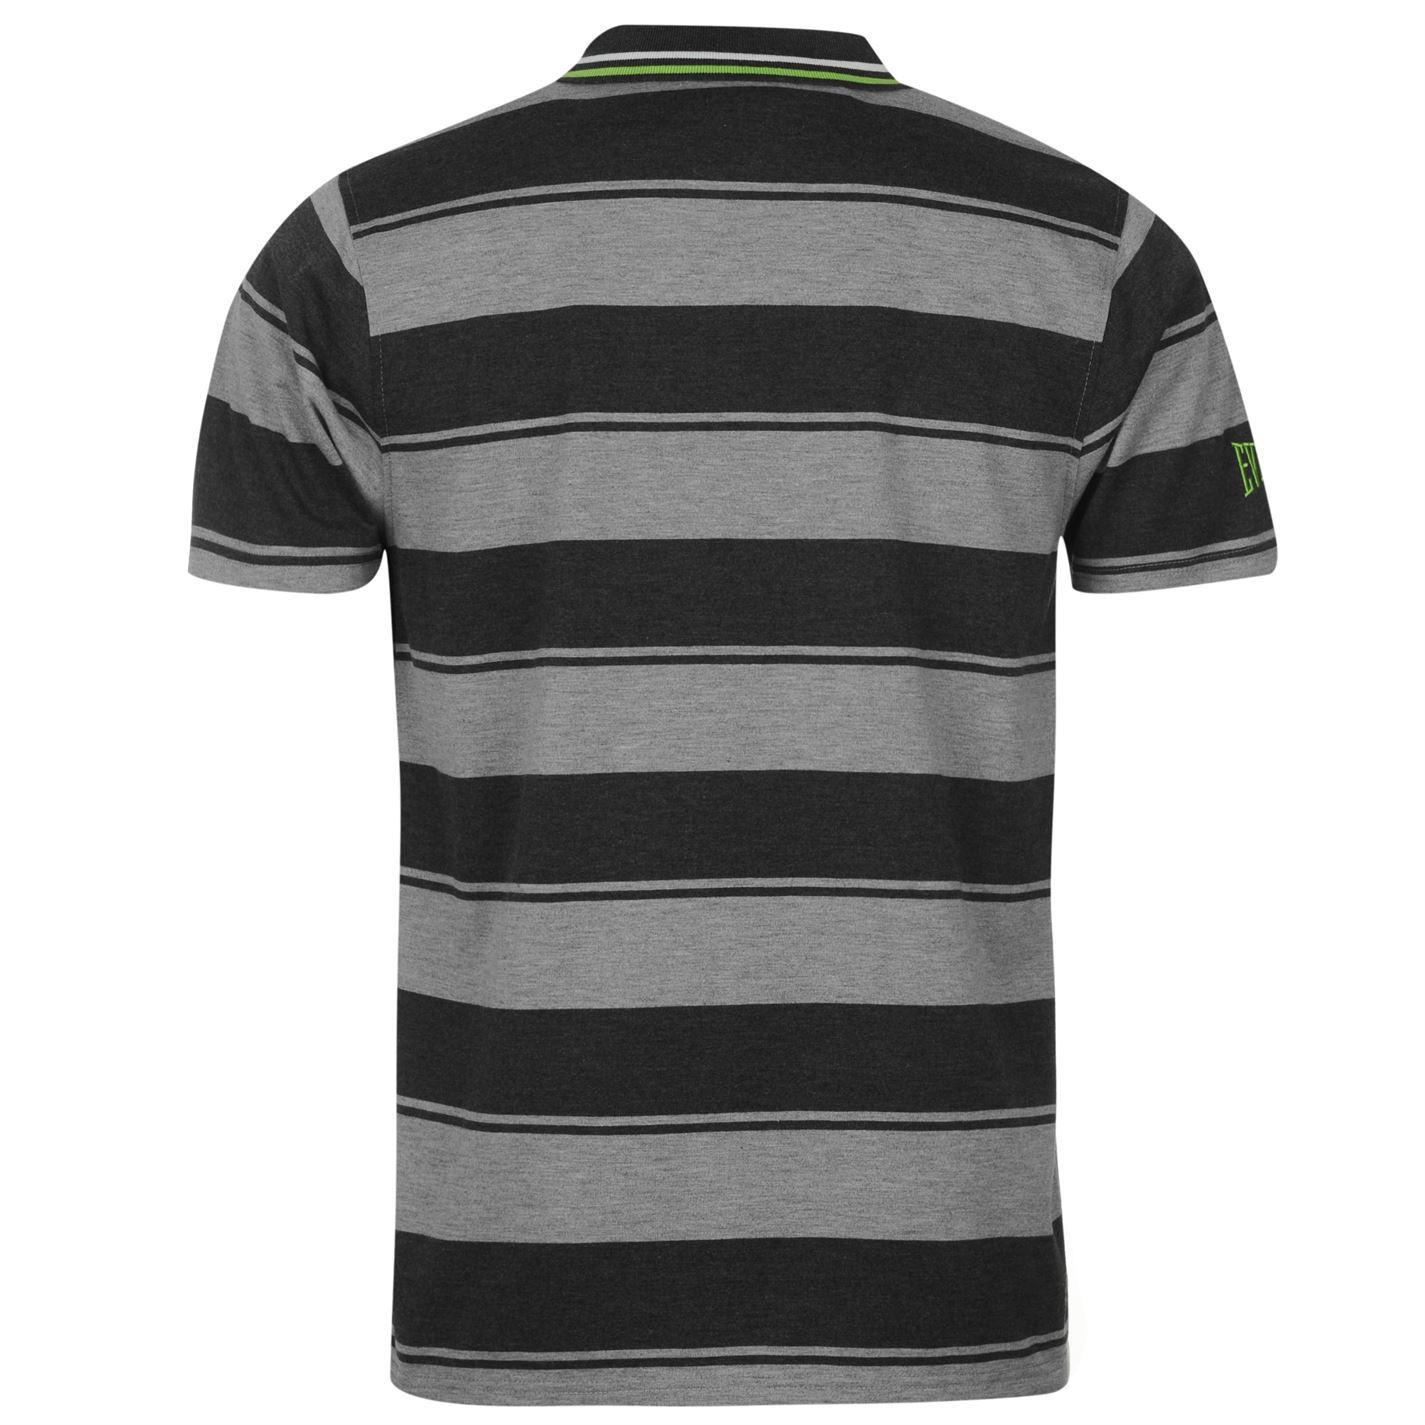 c931079e3 Details about Everlast Yarn Dye Bold Stripe Polo Shirt Mens Grey/Charcoal  Collar T-Shirt Top